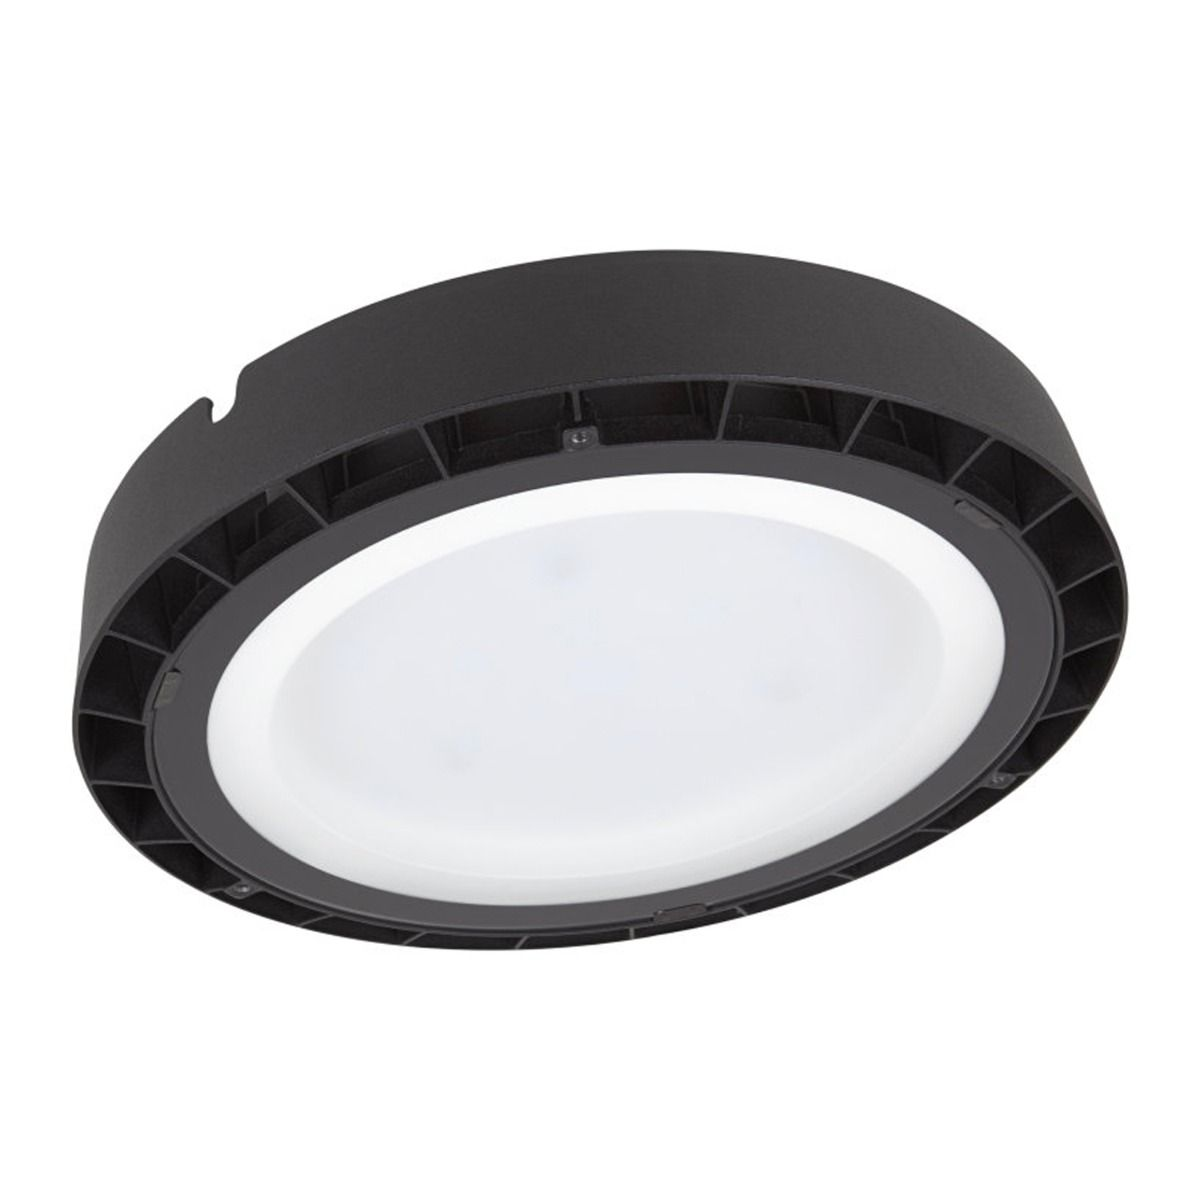 Ledvance LED High Bay Value 150W 6500K IP65 16000lm 100D | Päivänvalo Valkoinen - Korvaa 250W